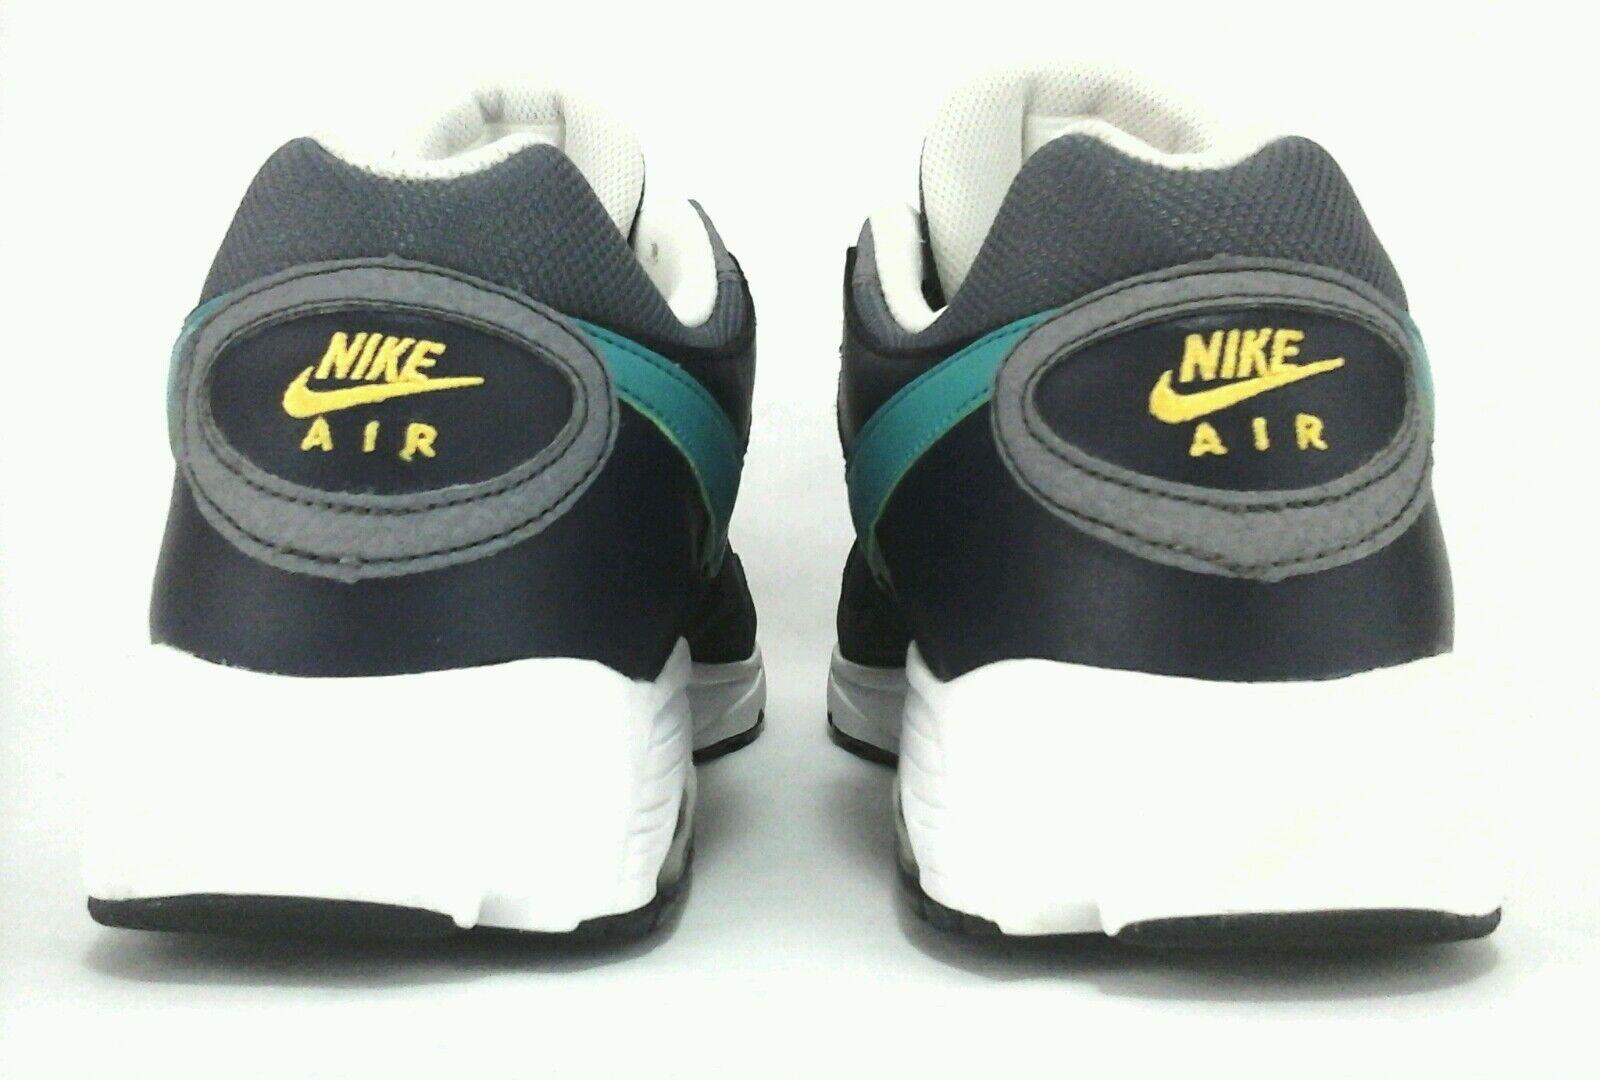 newest f73b5 d8467 NIKE AIR Max Sneakers Running Shoes Blue Gray Yellow Men s US 14 UK 13 EU  48.5